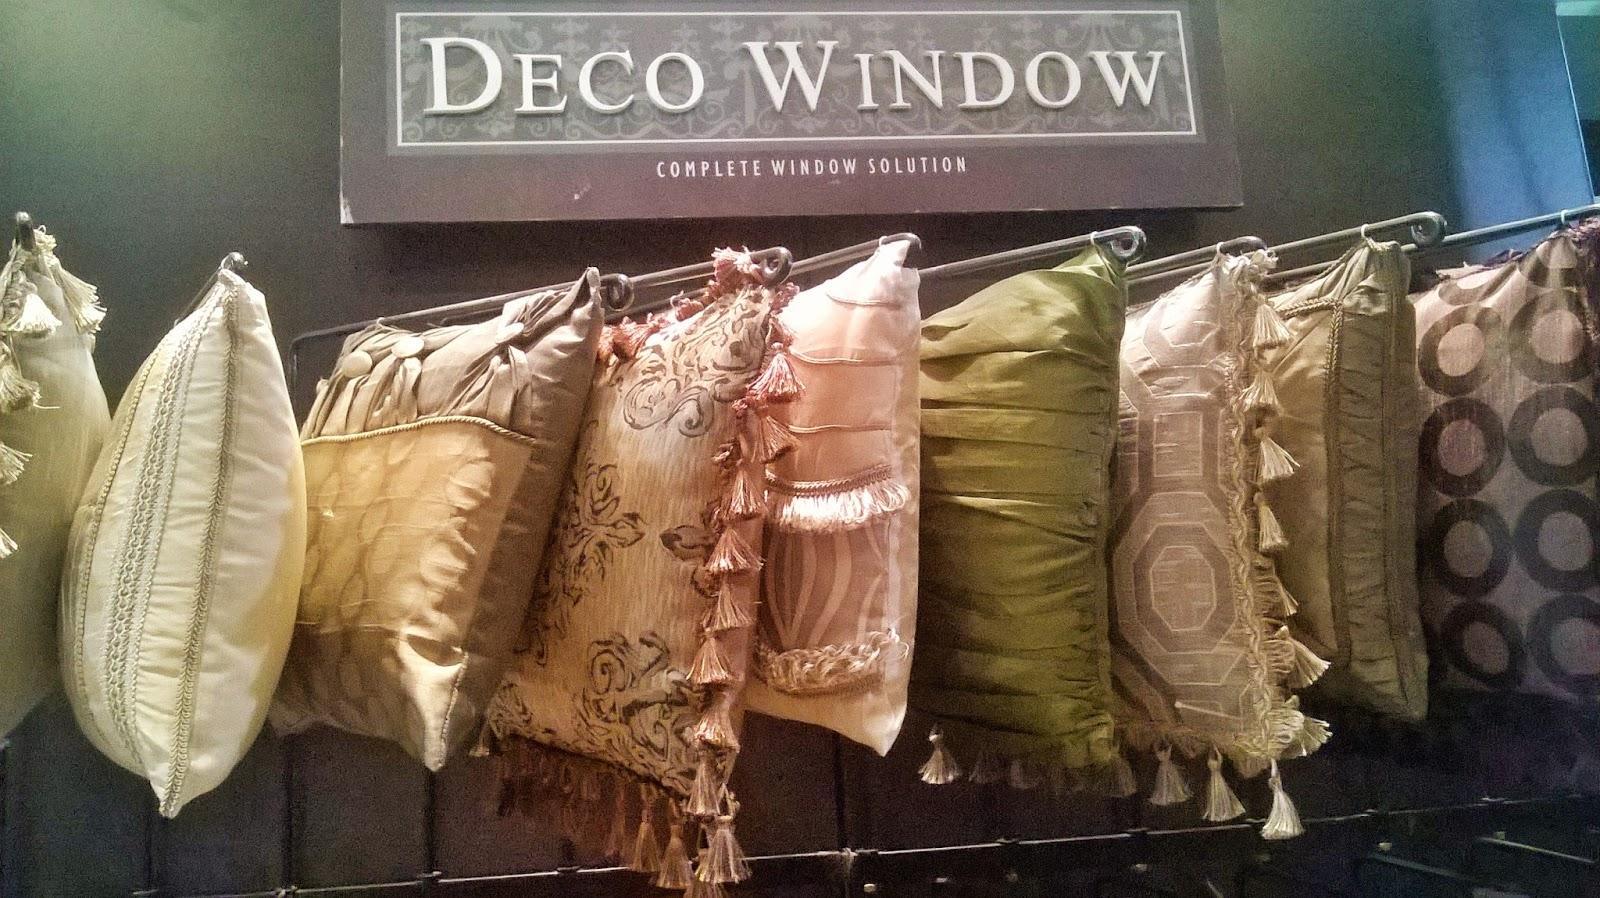 Beauty Amp Beyond Do Decor With Deco Window Amp Deco Home